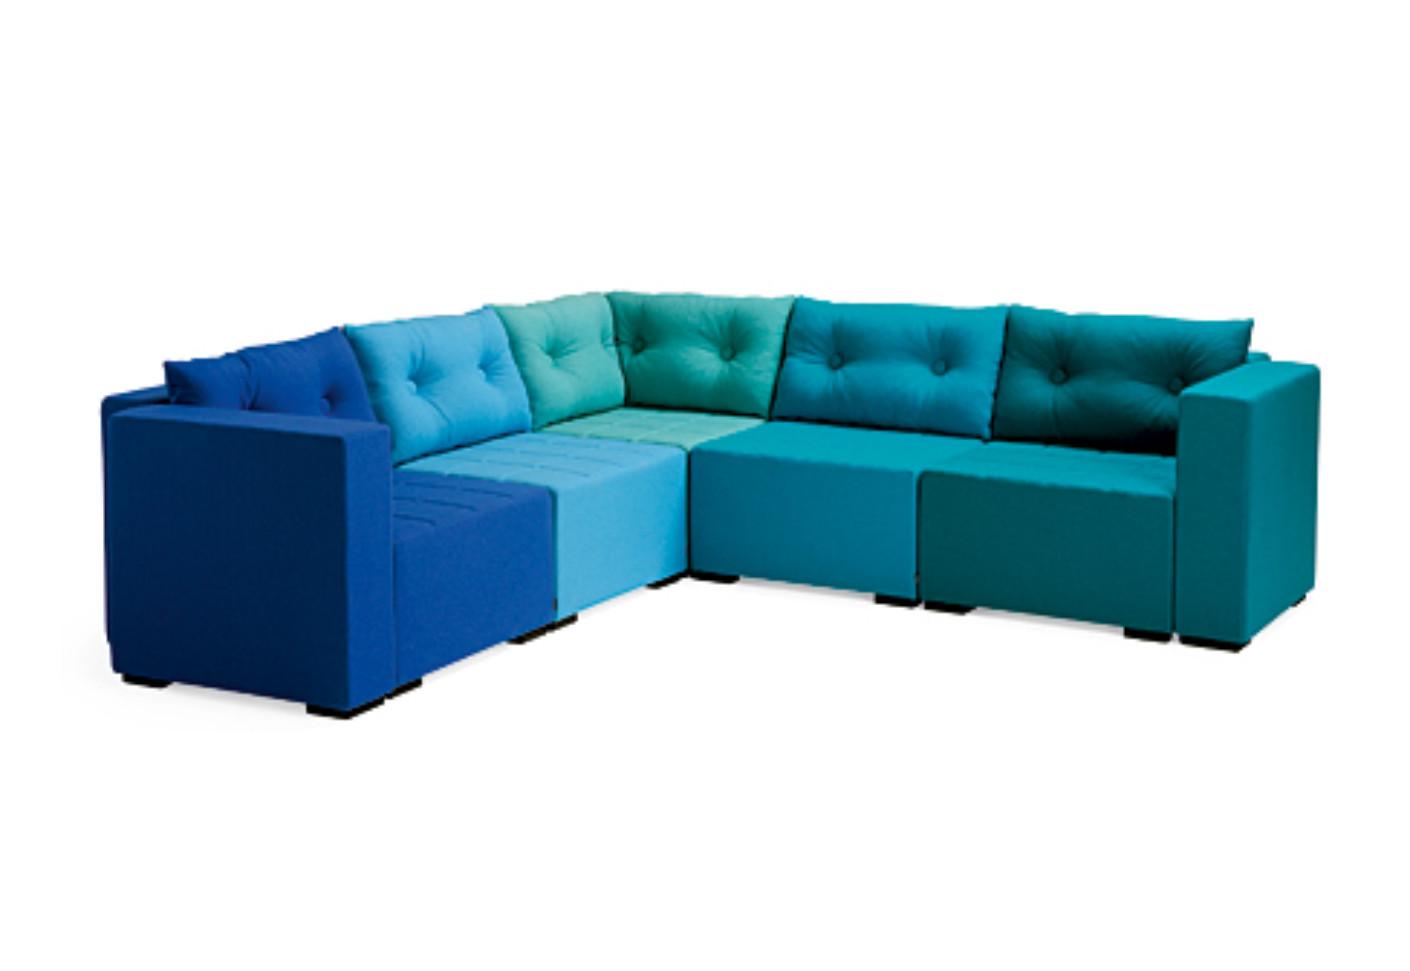 Monolog Corner Sofe By Materia Stylepark